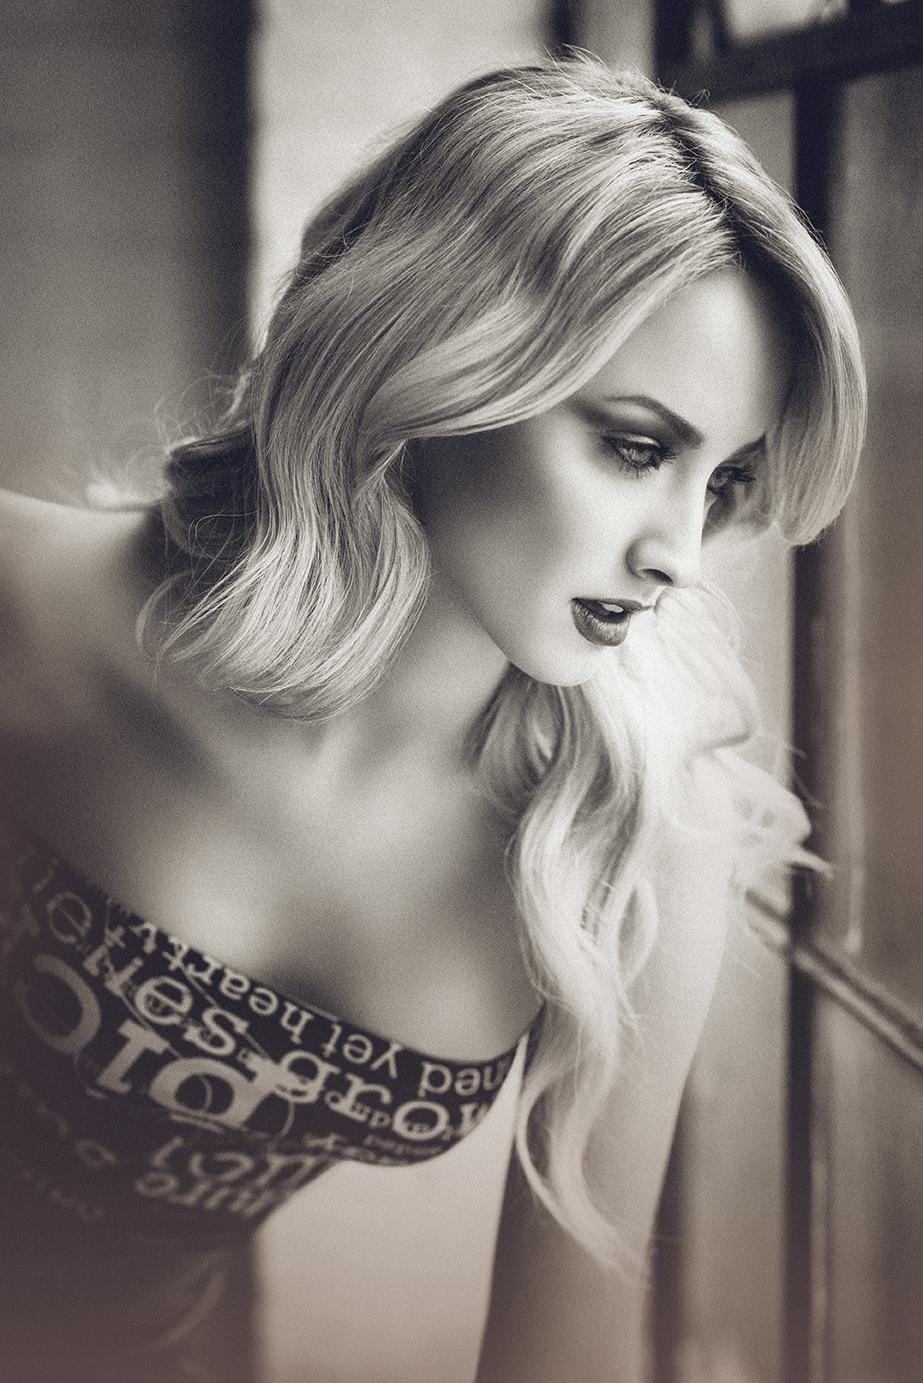 Andrew Etchen - Jessica Stepanova - hair makeup Olga Onulov